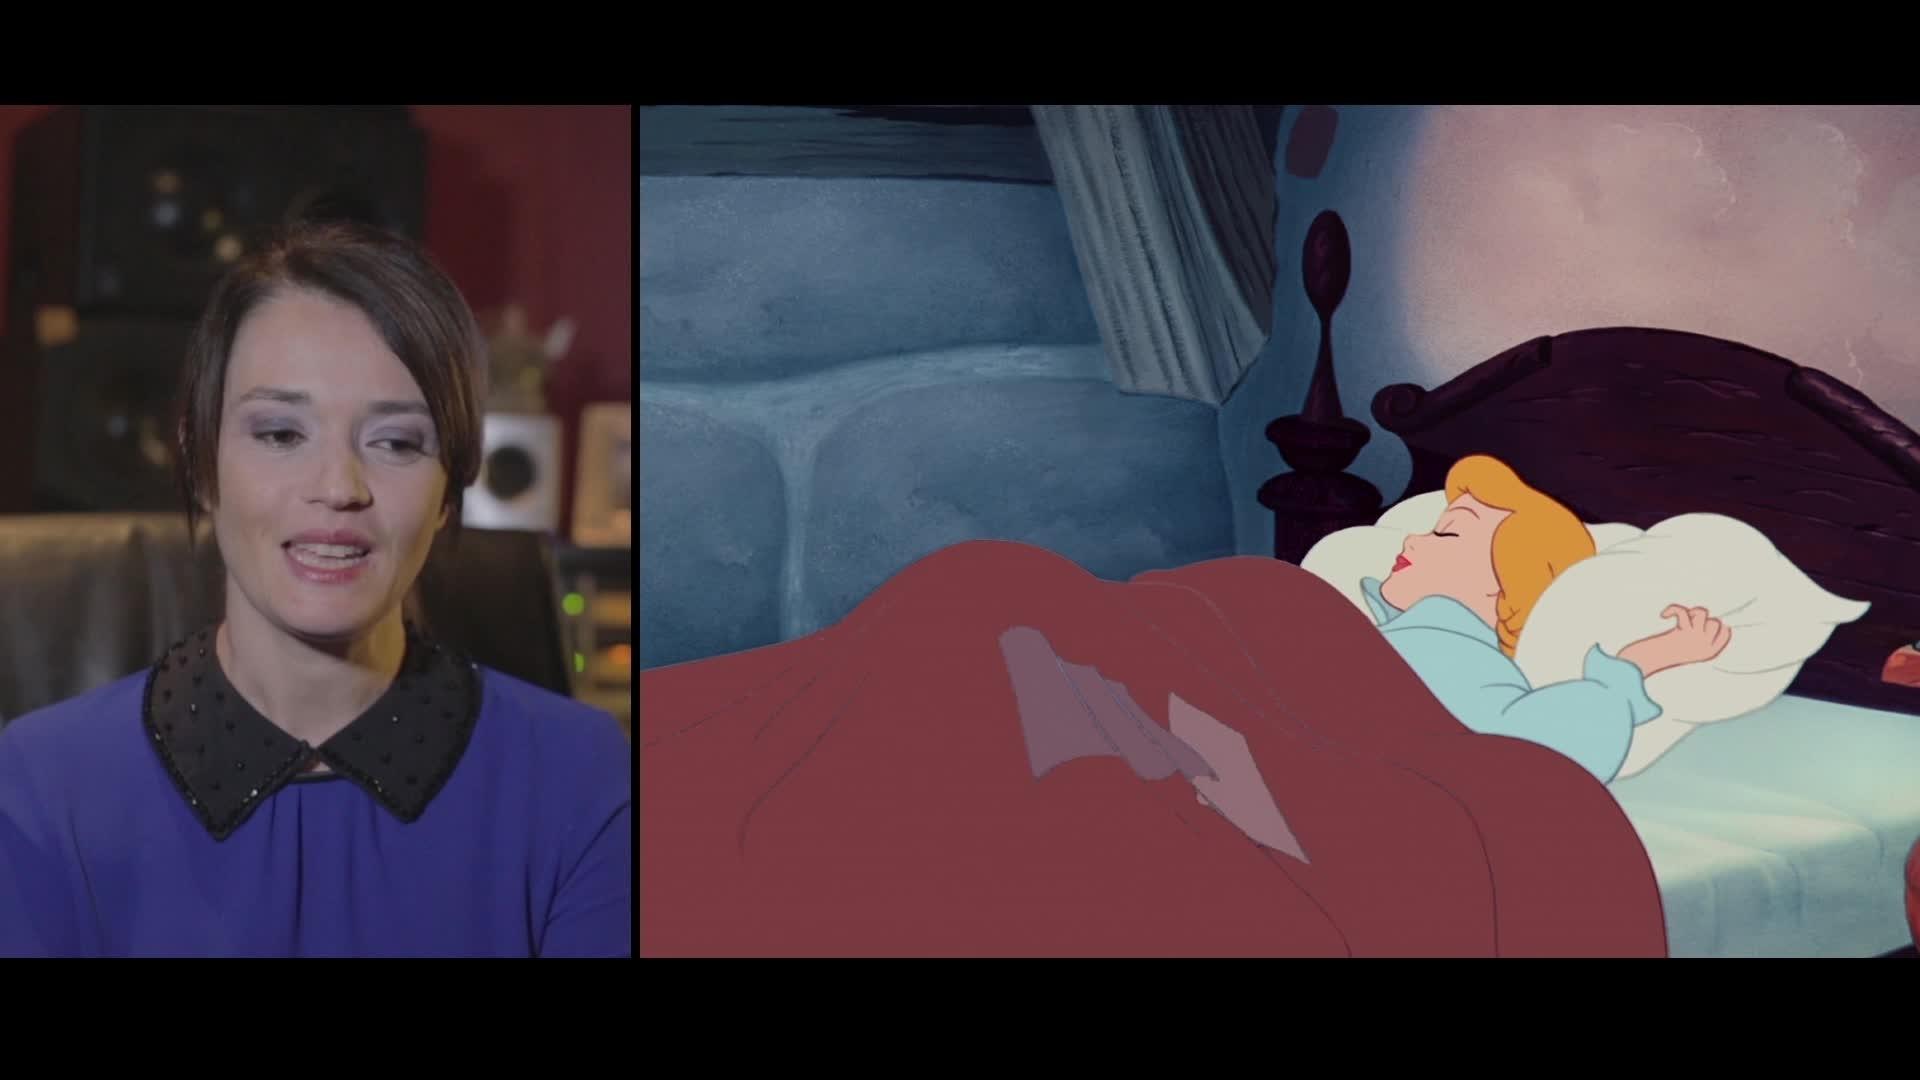 We love Disney - Carmen Consoli